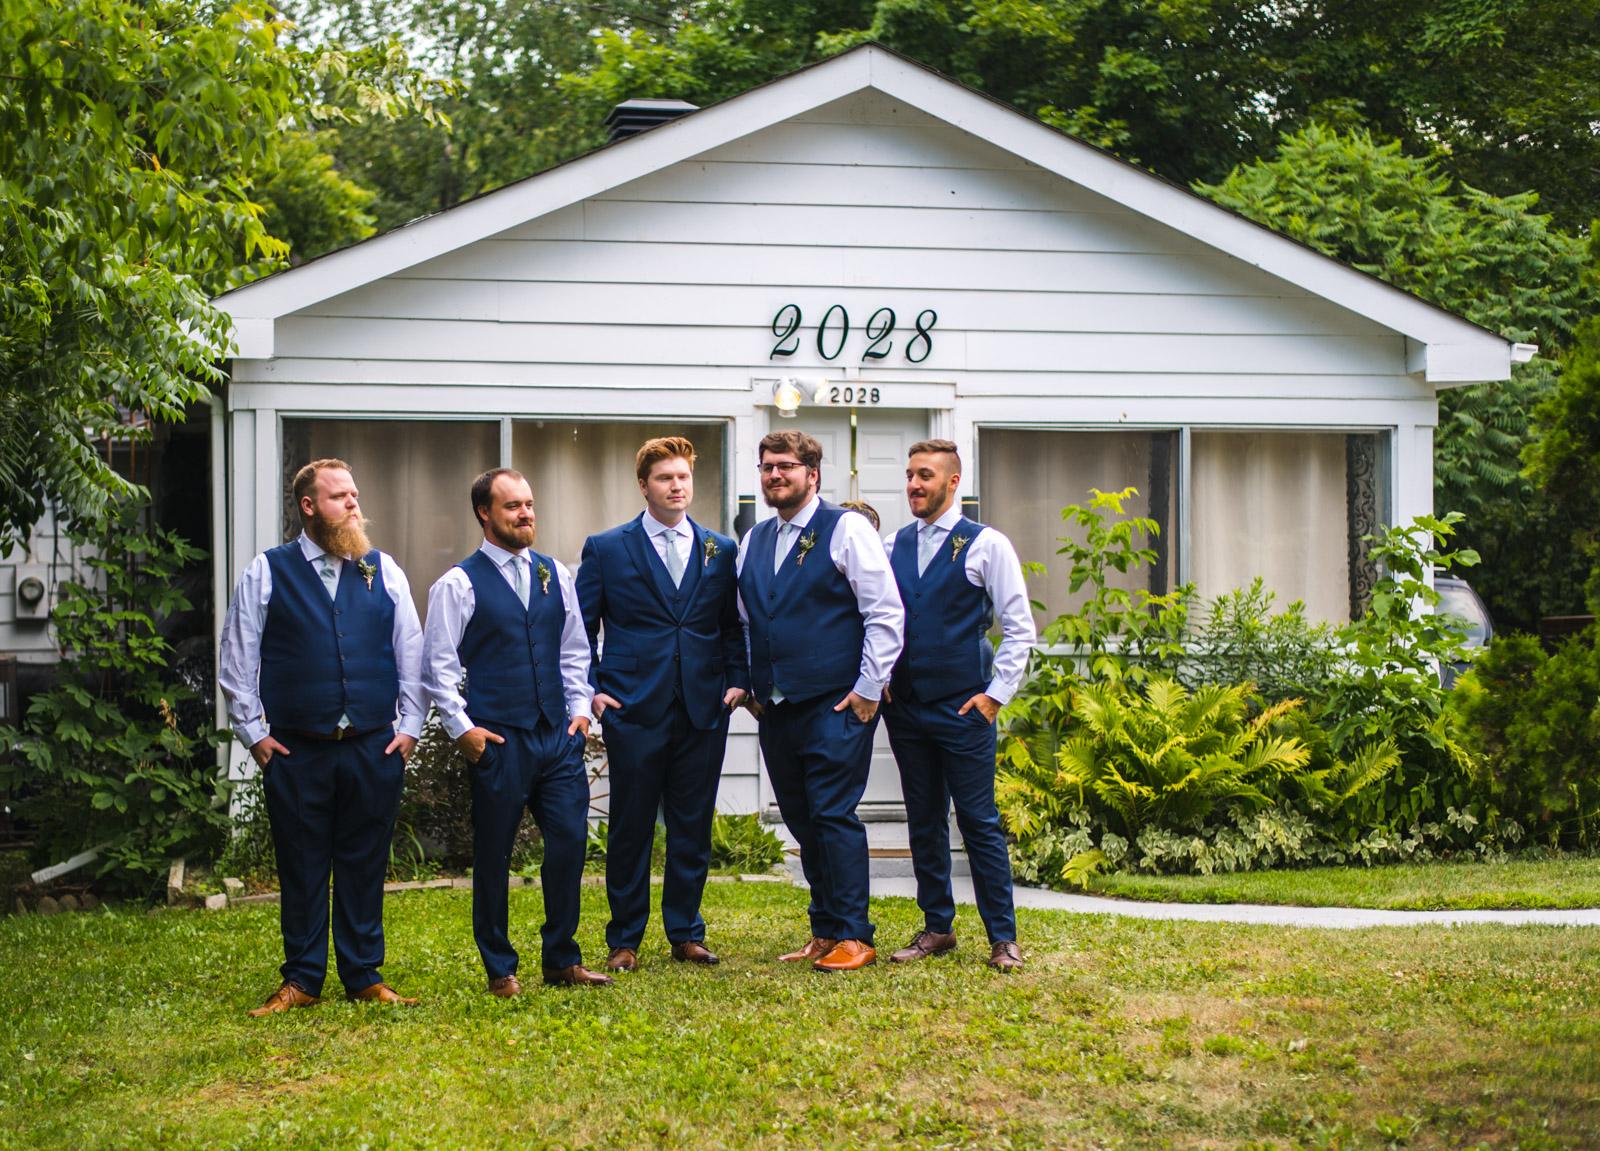 Emerson & Elicia's Golf Course Wedding Aidan & Leanne Hennebry Hamilton Wedding Videographers Photographers Niagara Hush Hush Photography & Film-8.jpg